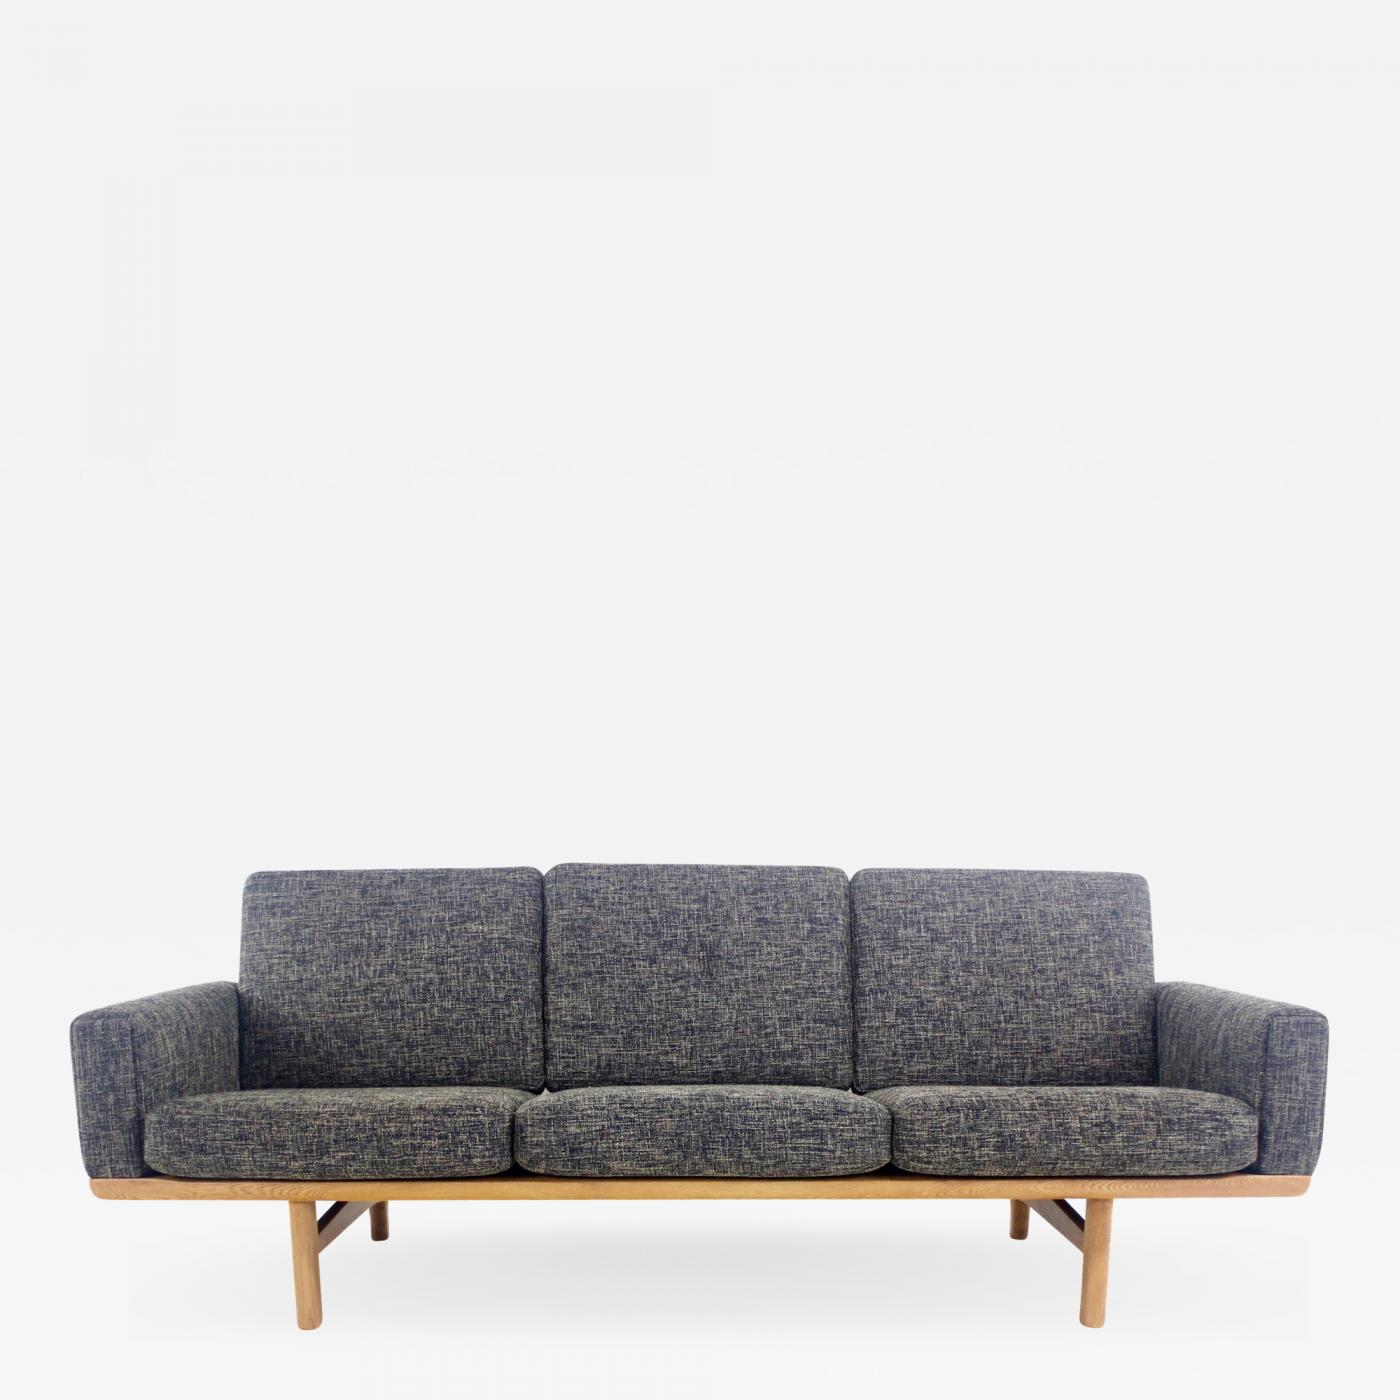 Hans Wegner - Exceptional Scandinavian Modern Sofa Designed by Hans Wegner